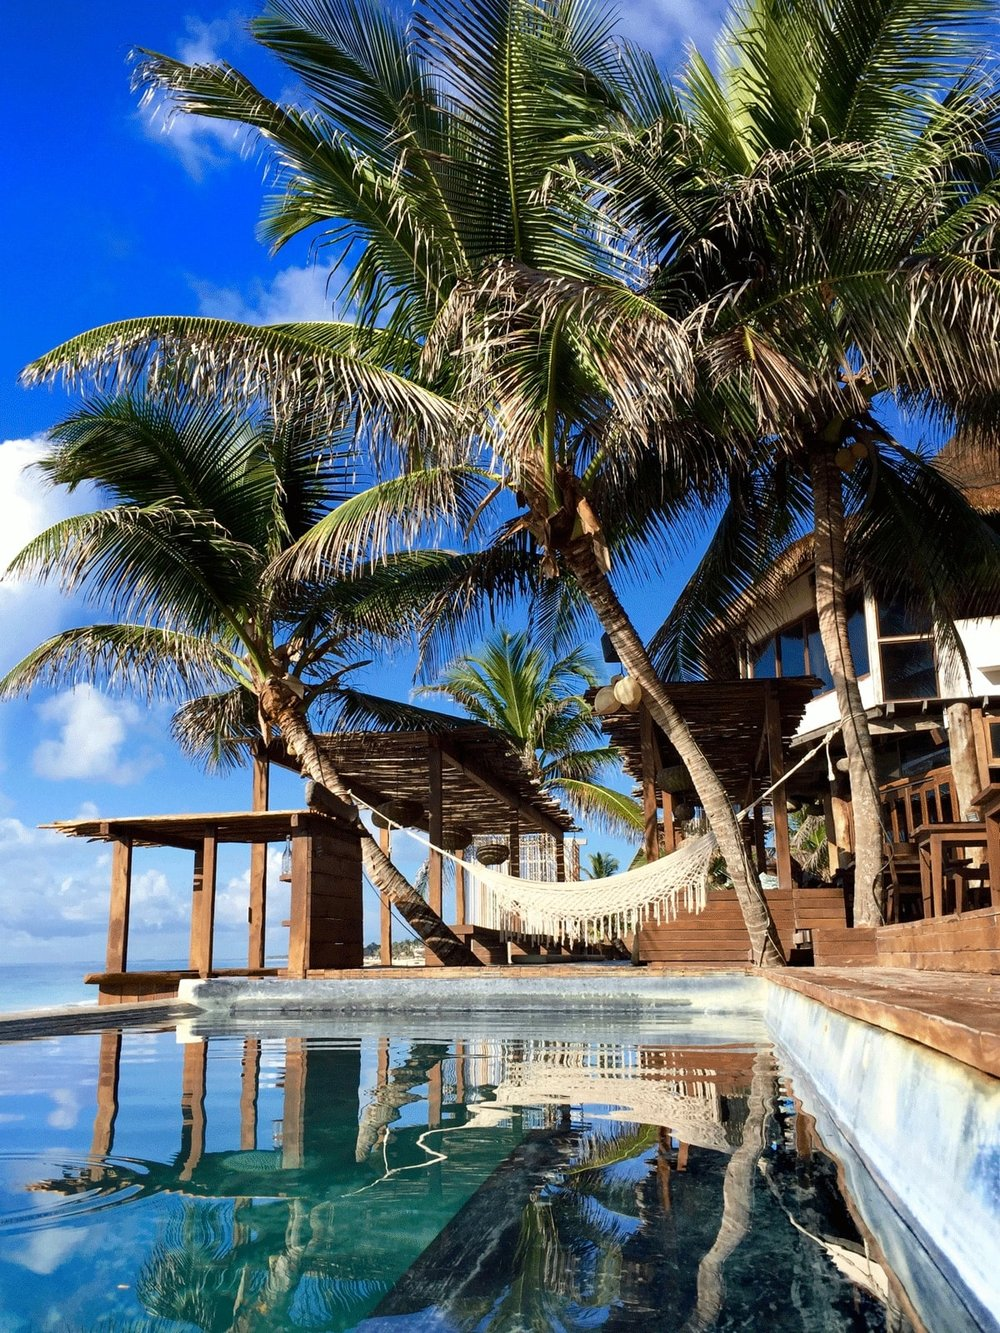 amansala-tulum-mexico-wellness-resort-28-3-min.jpg